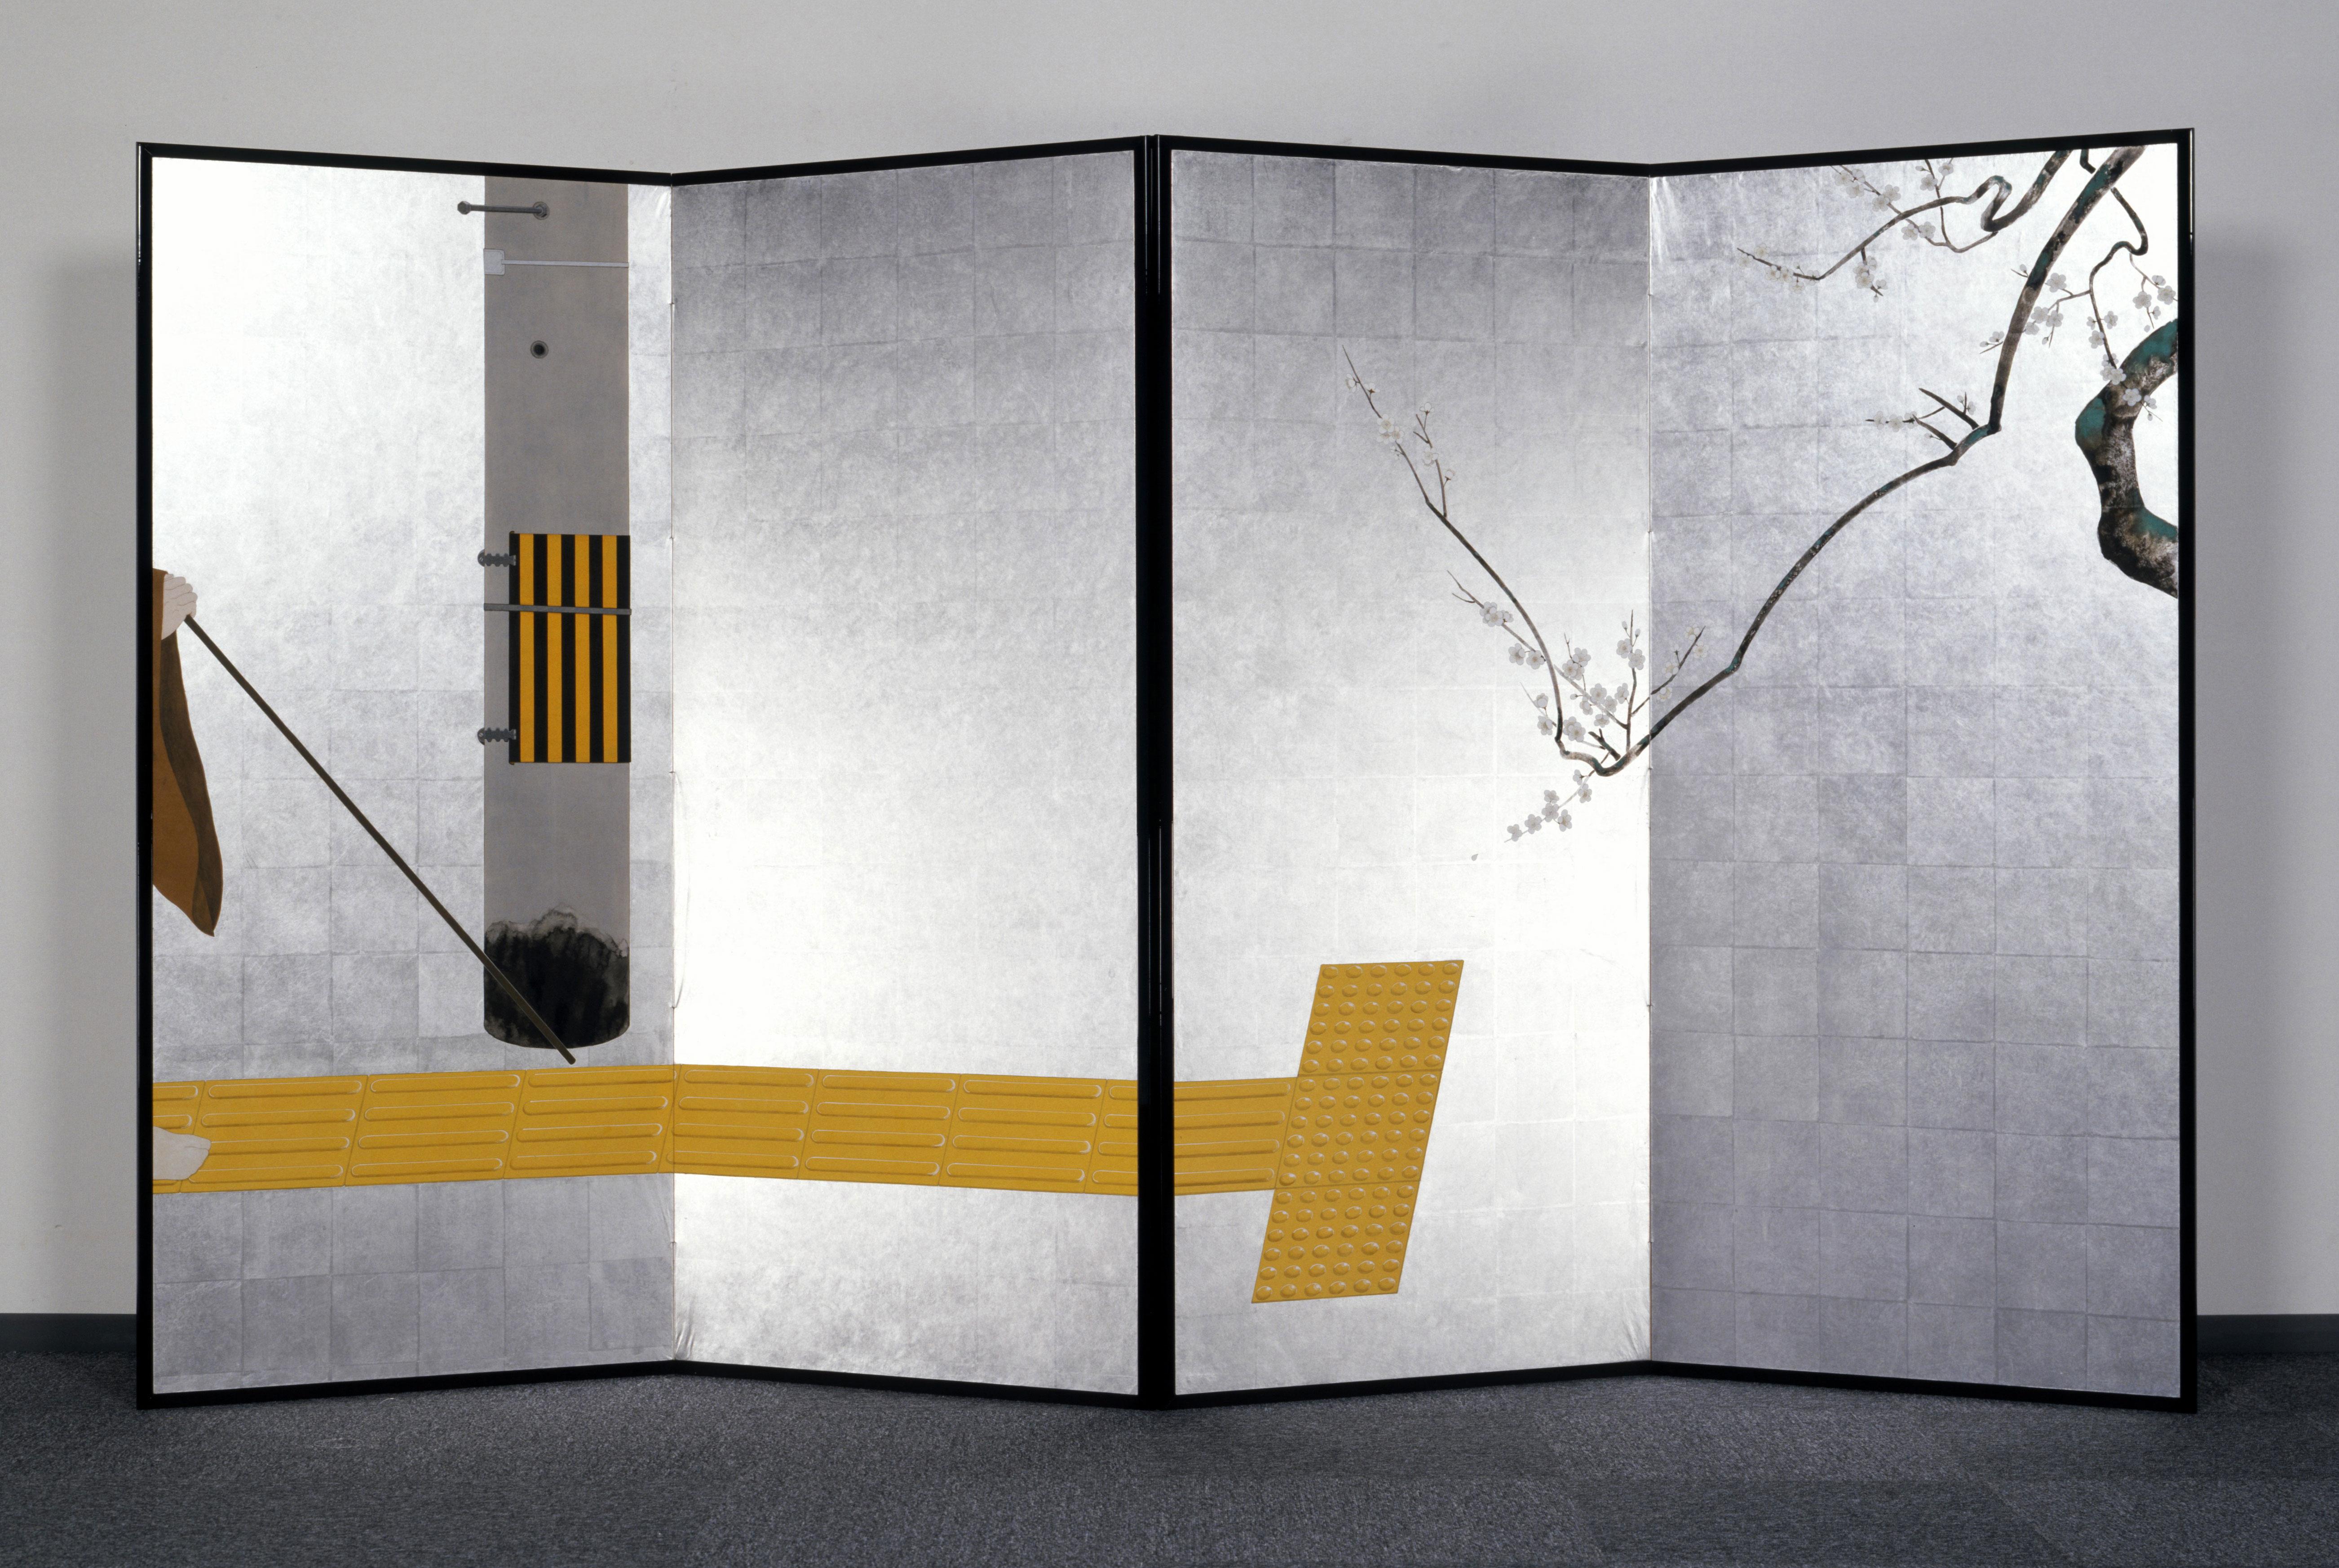 「白梅点字ブロック図屏風」 2006年 二曲一双 各166.7×145.6cm  紙本銀地着色 (VOCA2007 VOCA賞受賞作品) ©️Taro Yamamoto , courtesy of imura art gallery